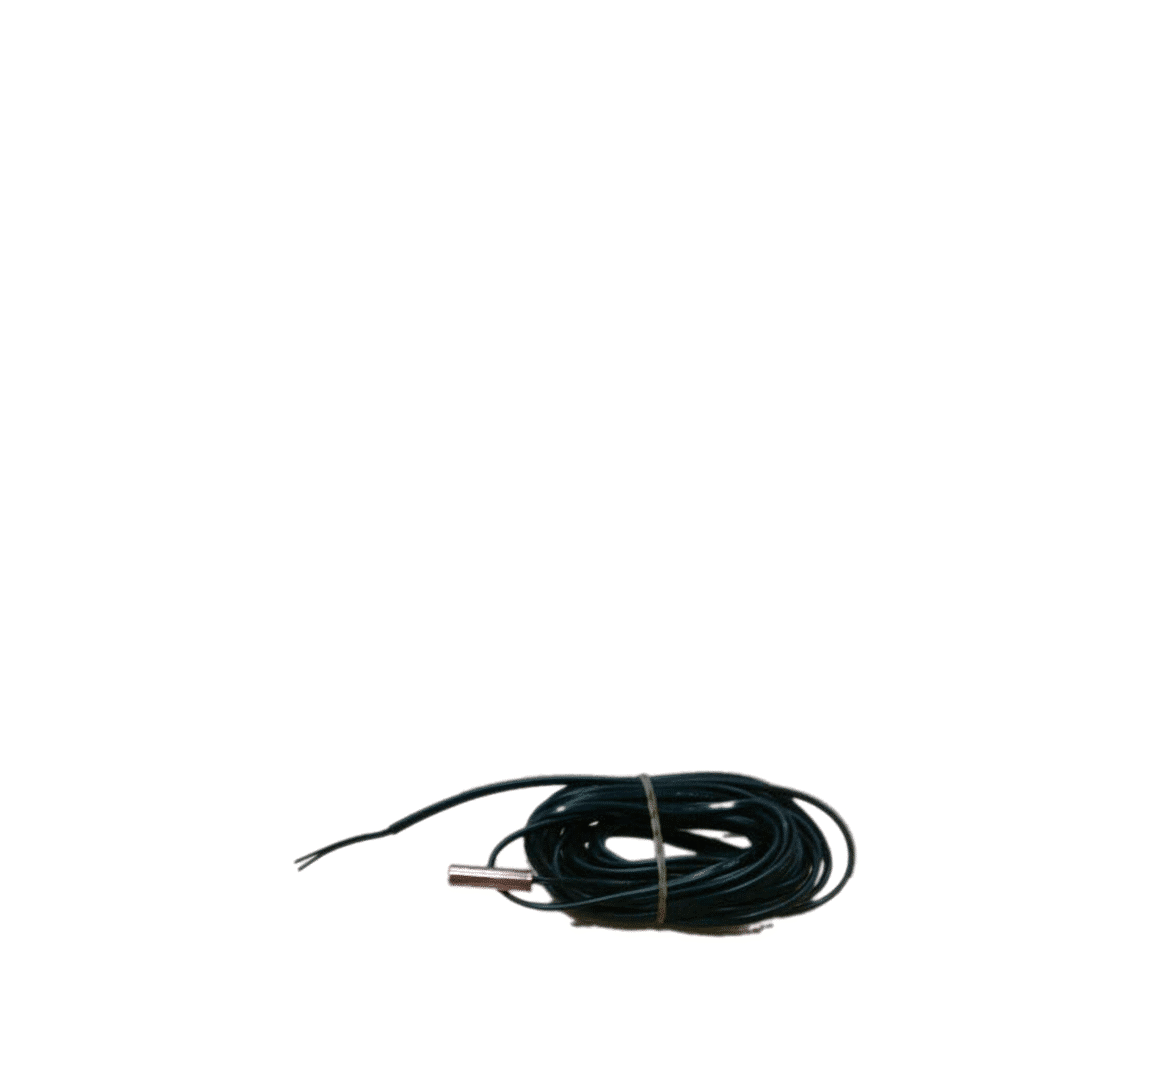 Tank sensor met 6m kabellengte van DHPS